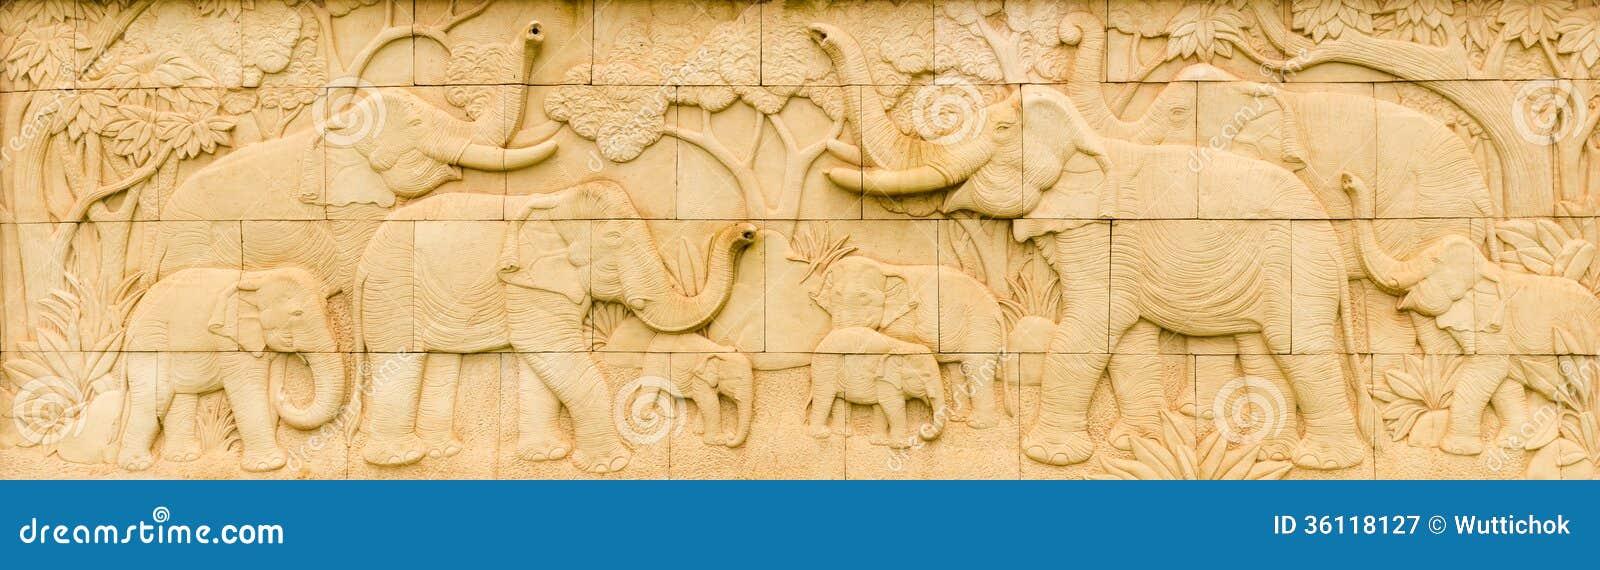 Elephant Thai sandstone